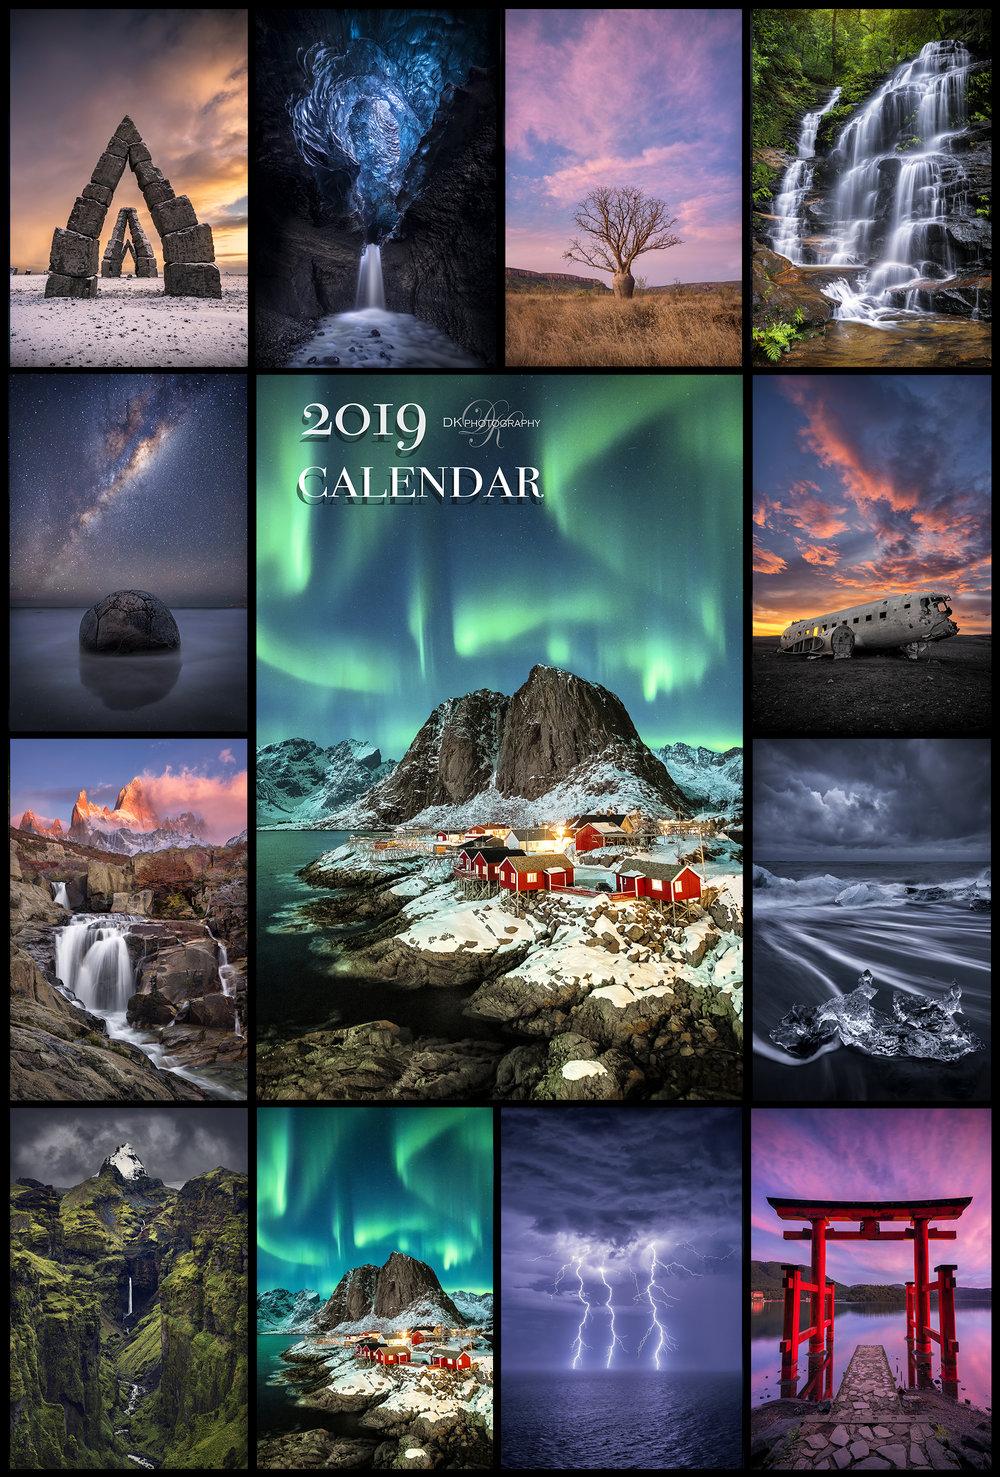 2019 Calendar ad.jpg